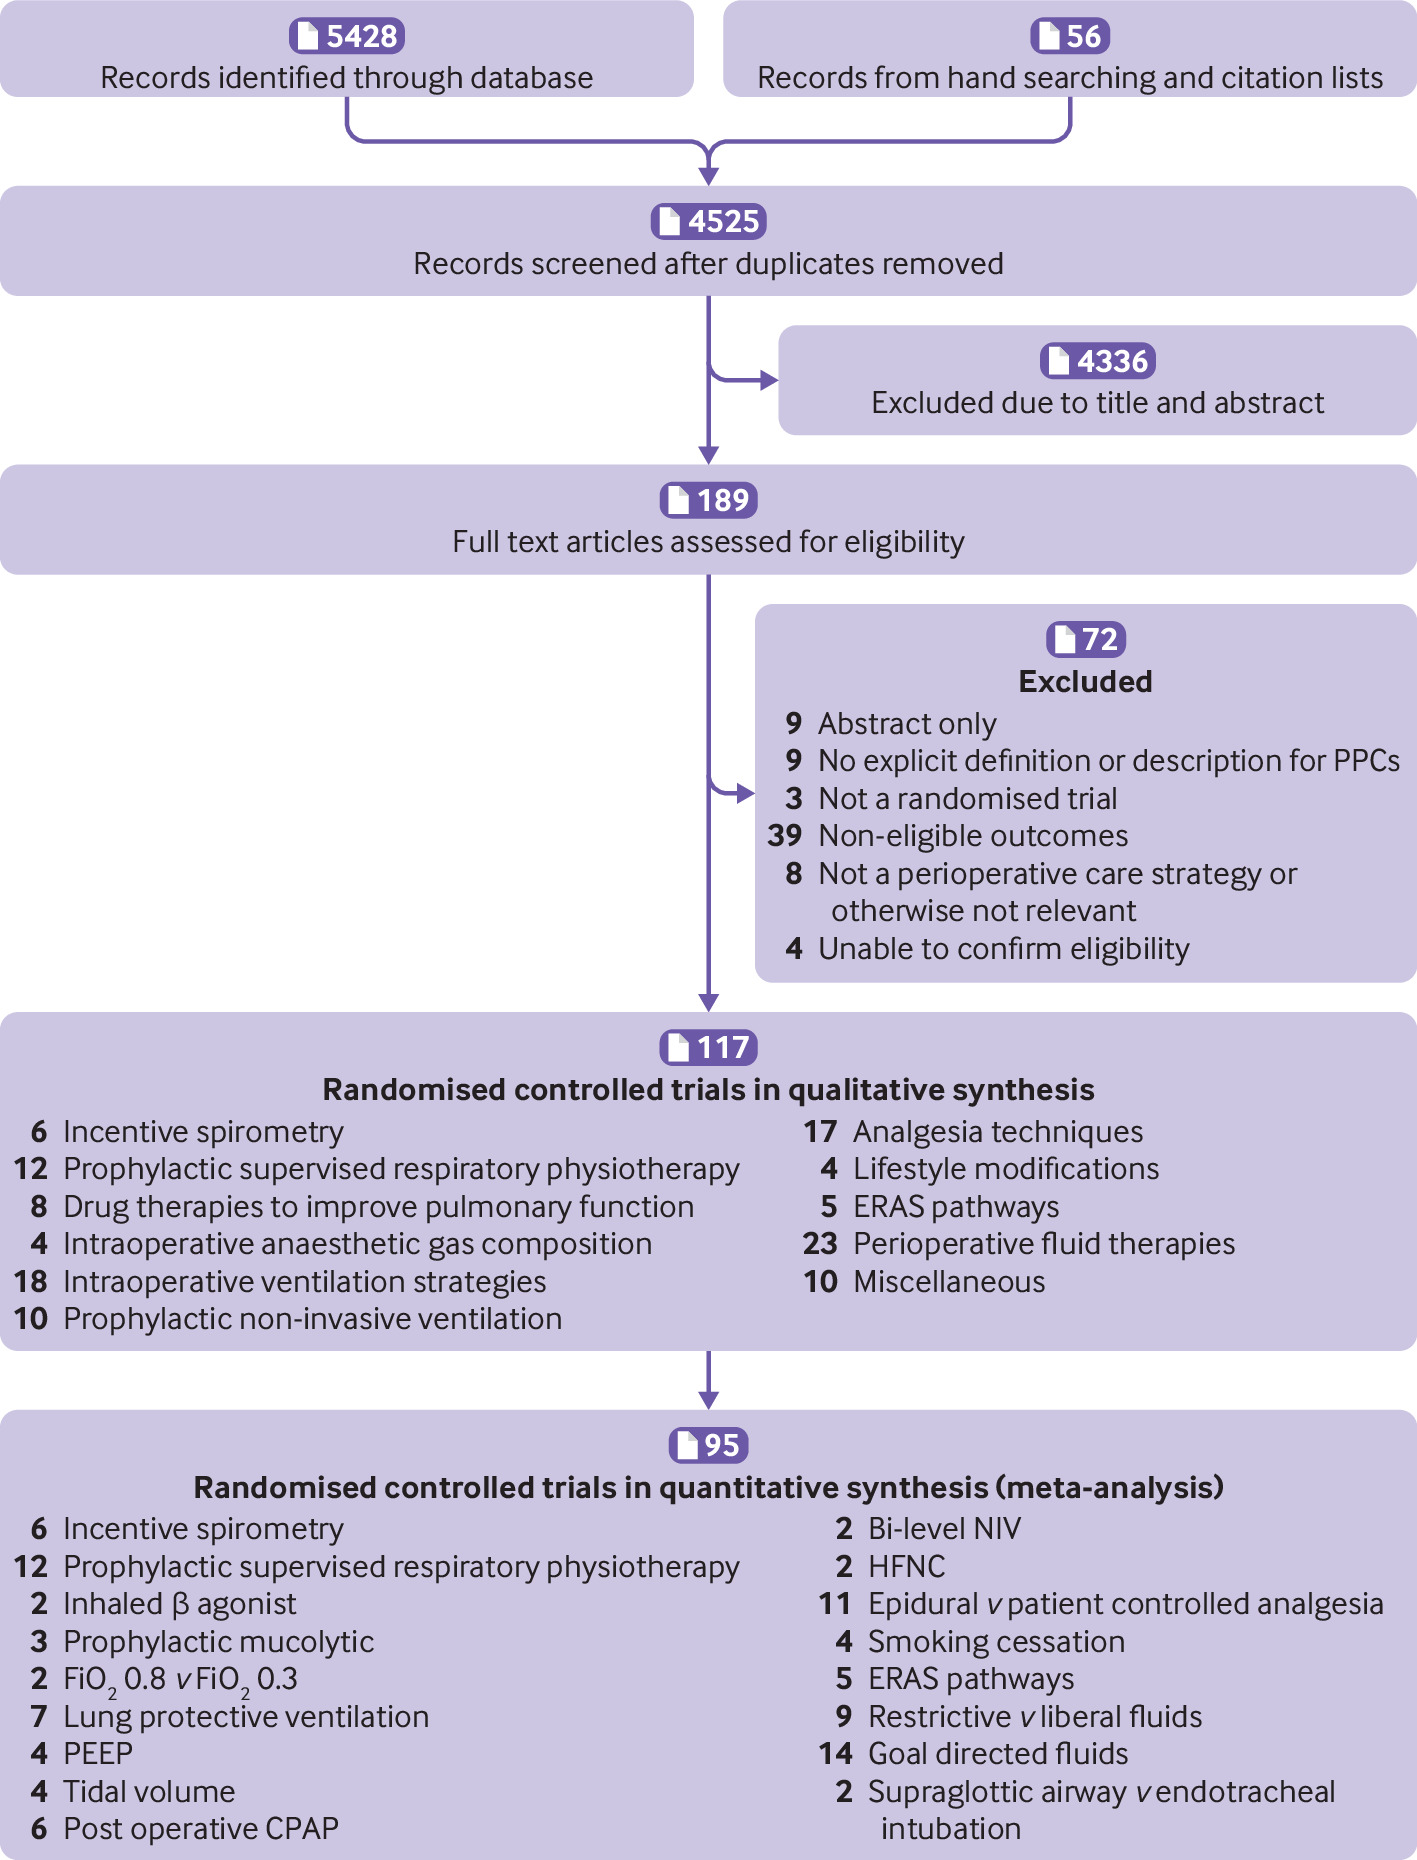 [BMJ发表论文]:围手术期干预措施预防术后肺部并发症的meta分析